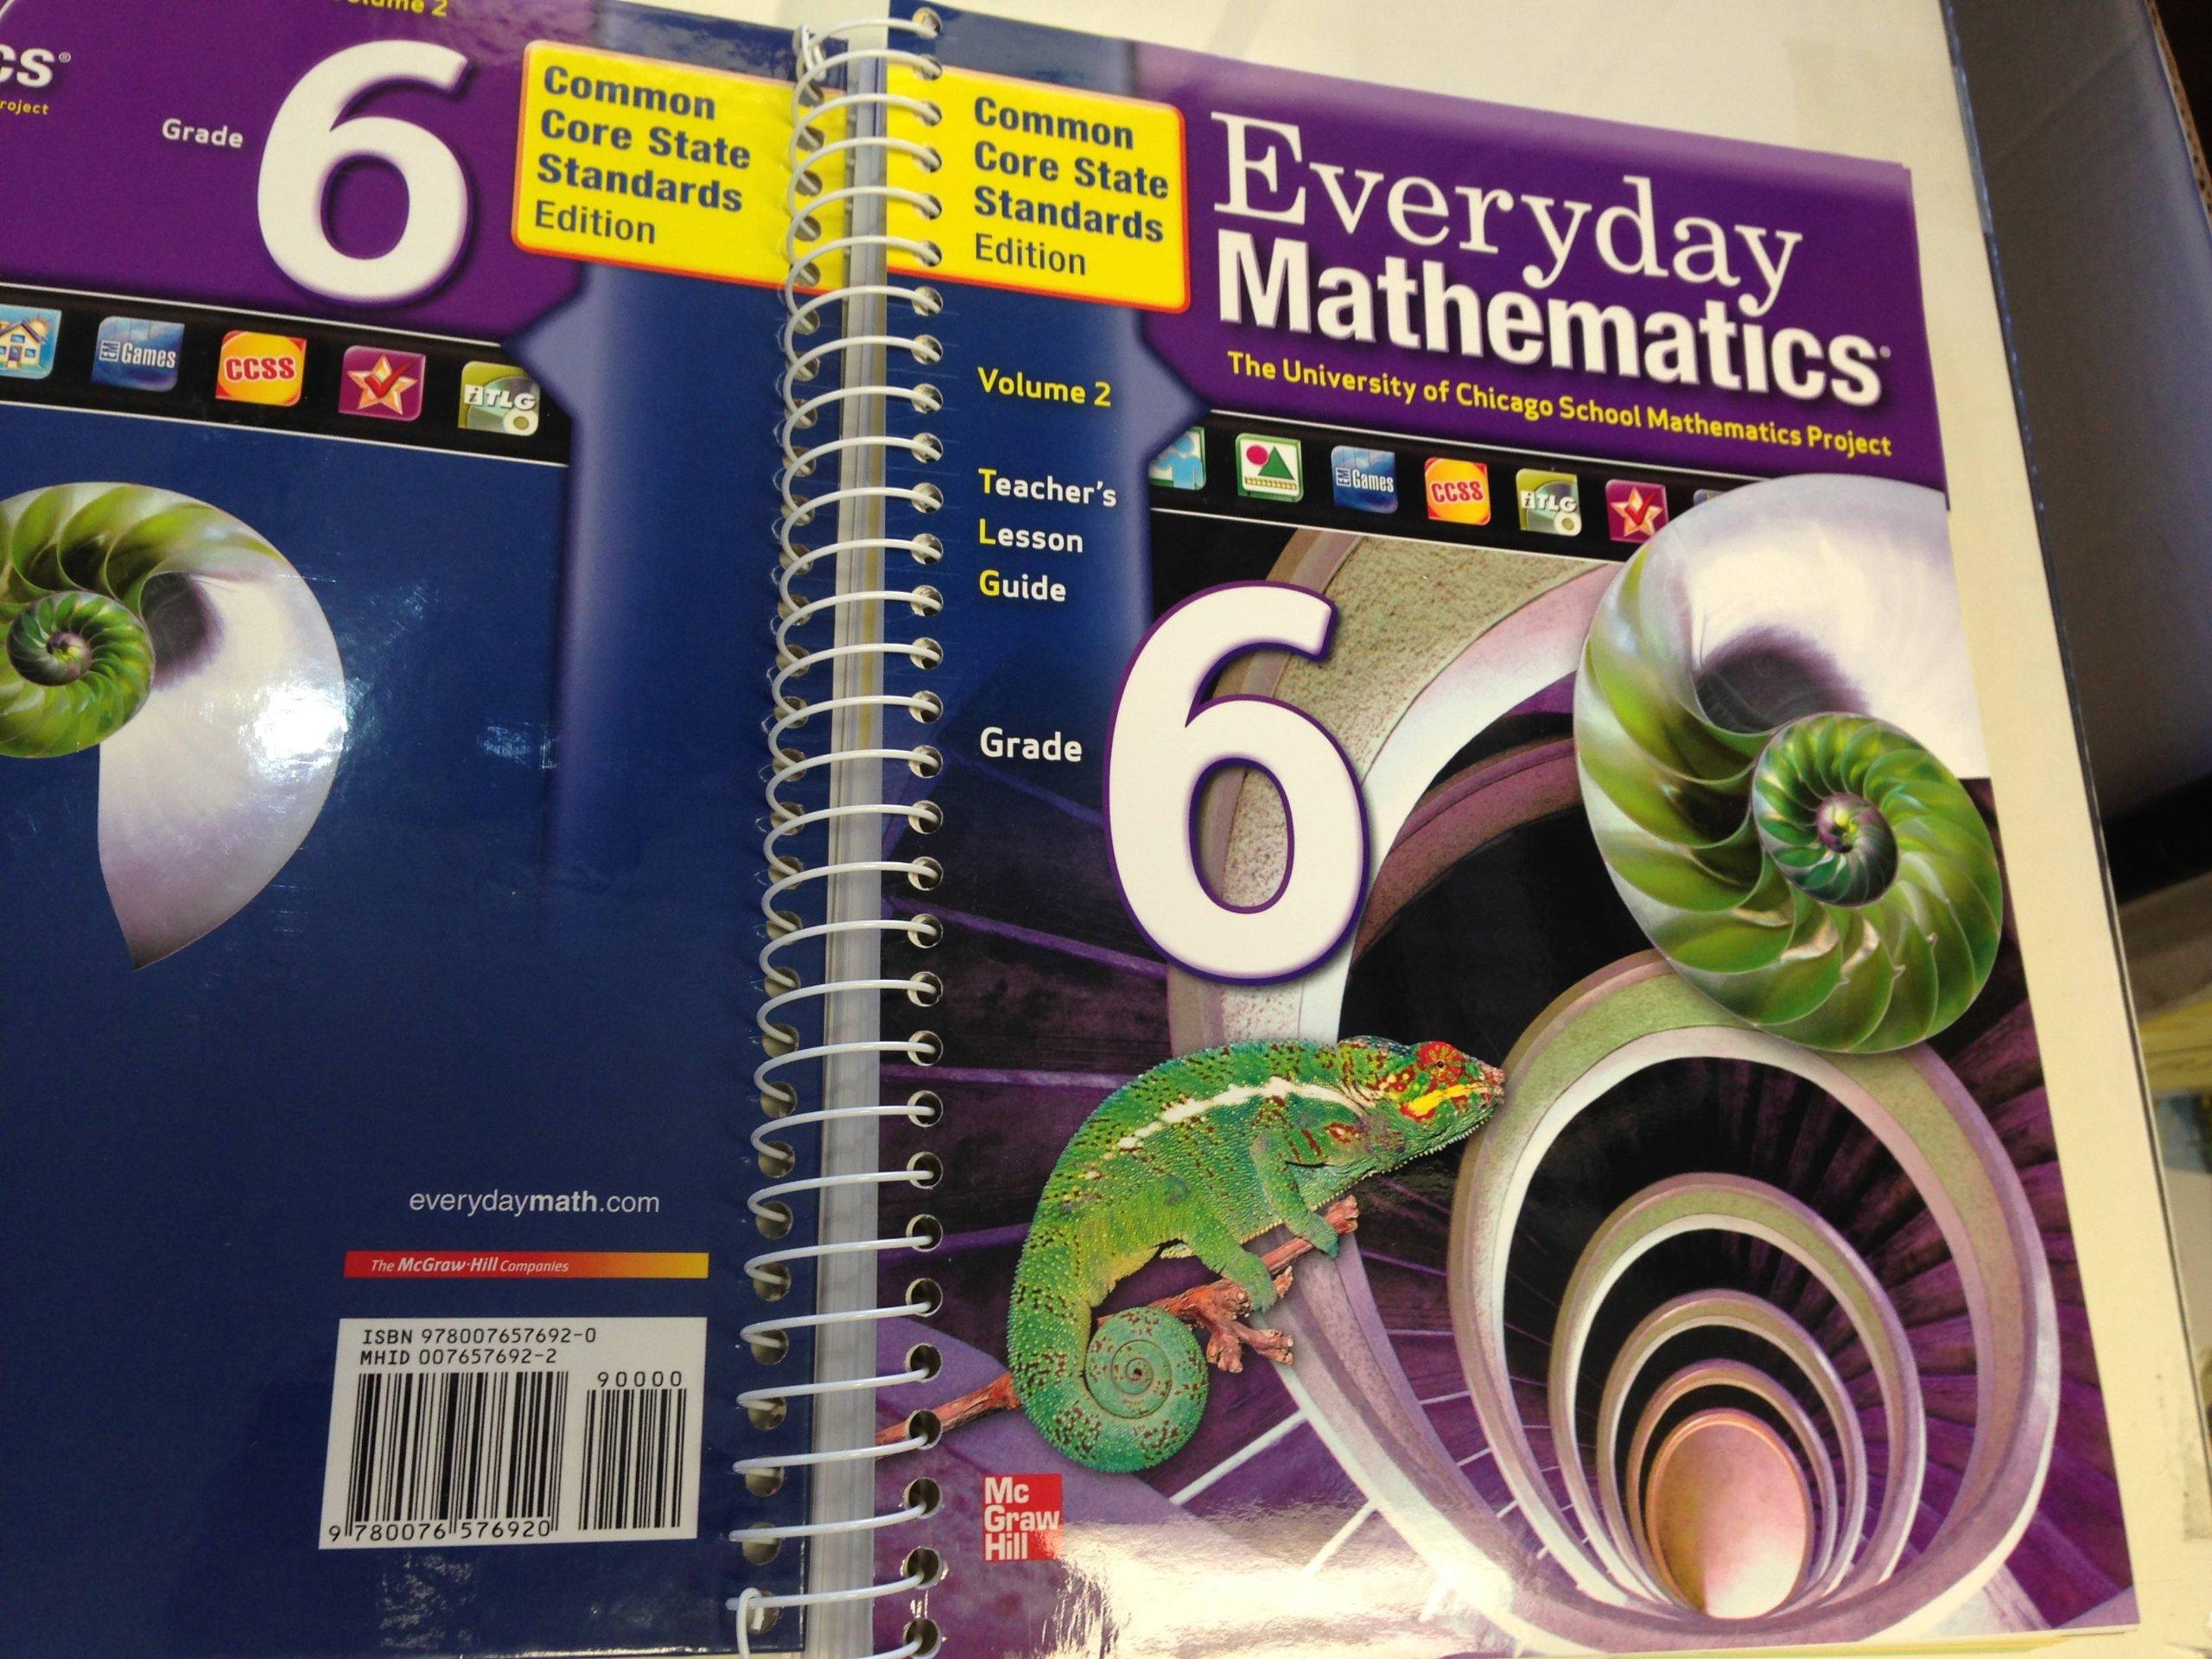 Amazon.com: Everyday Mathematics Grade 6 Teacher\'s Lesson Guide Vol ...